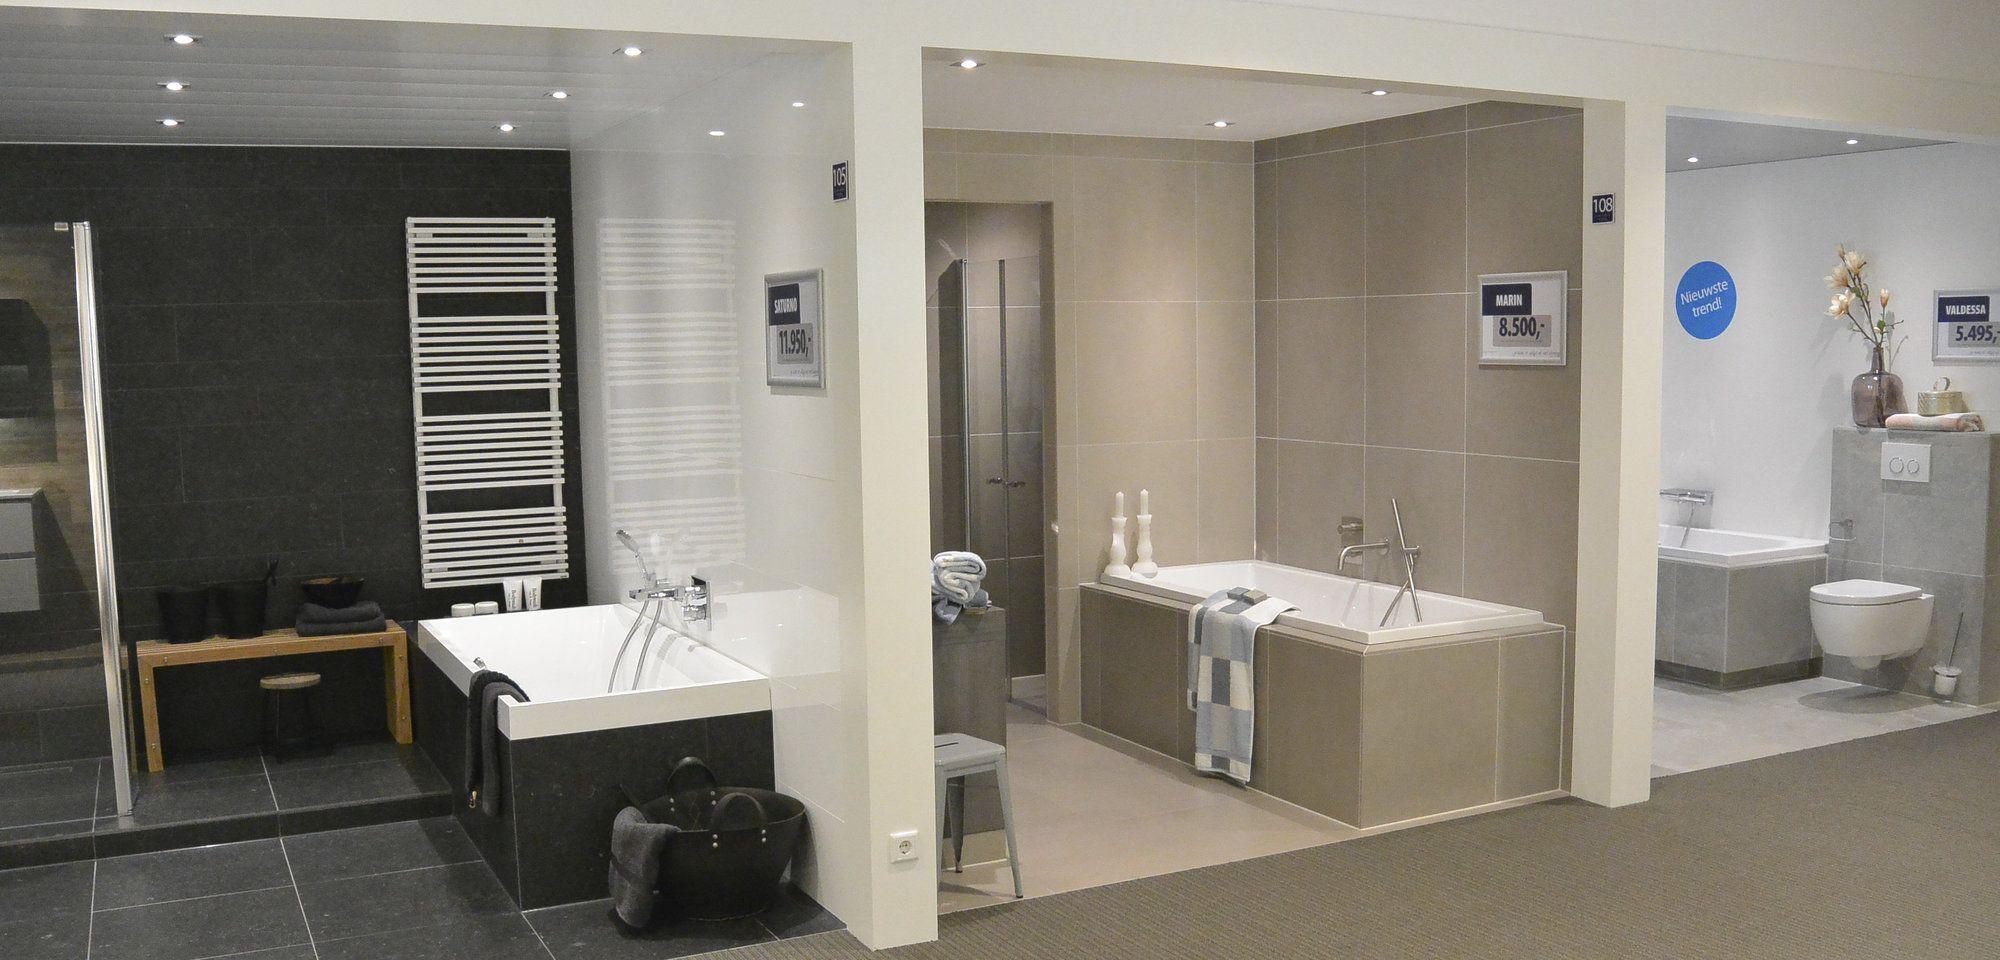 Pin van Wooning Keukens & Badkamers op Showroom Spijkenisse | Pinterest